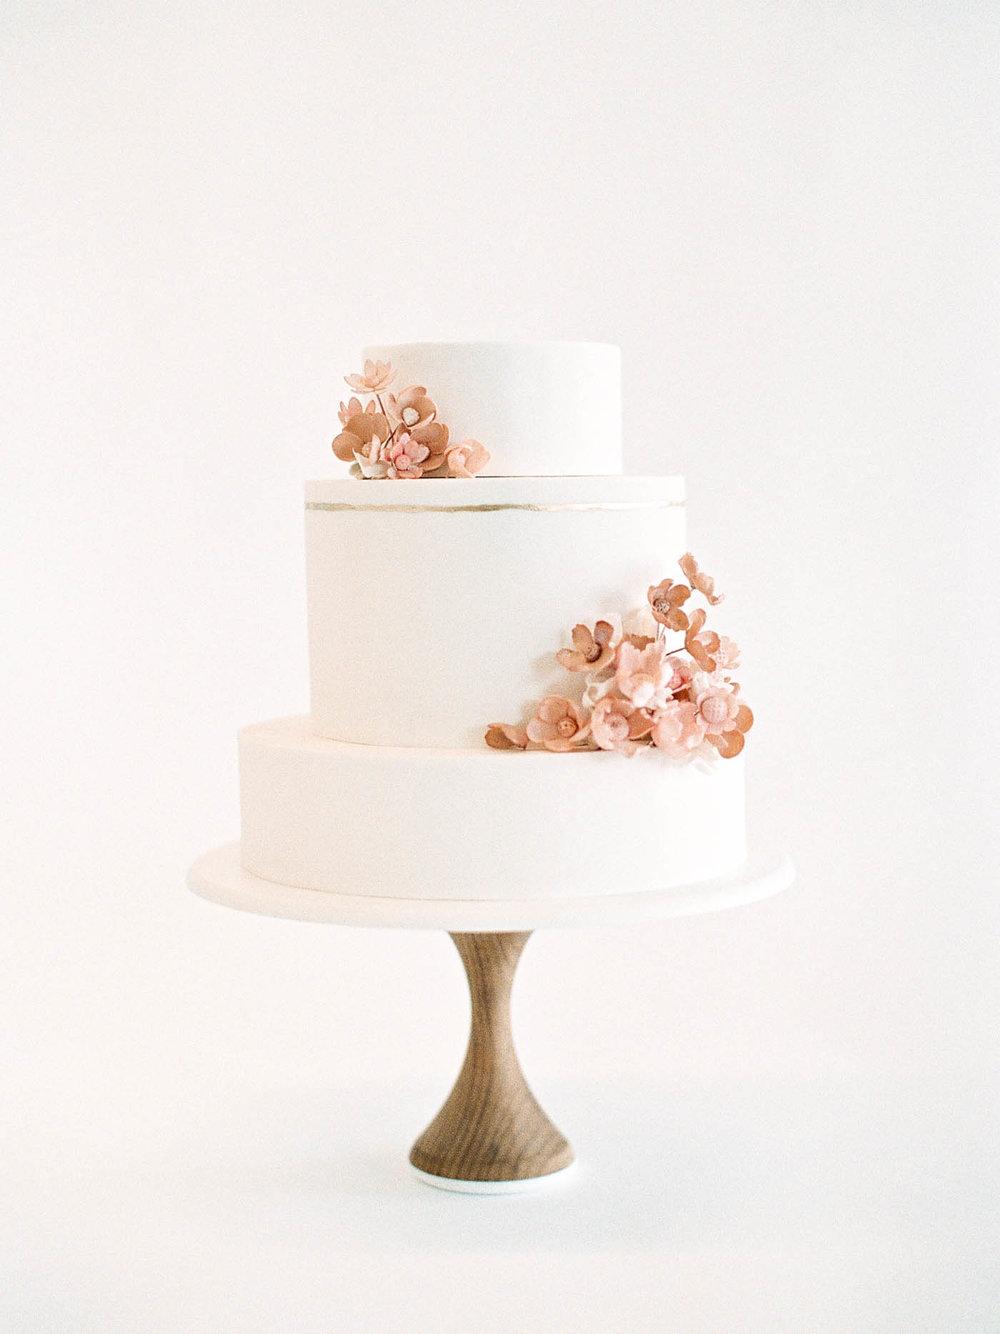 Delicate-Wedding-Cakes-4-Jen_Huang-002343-R1-028.jpg